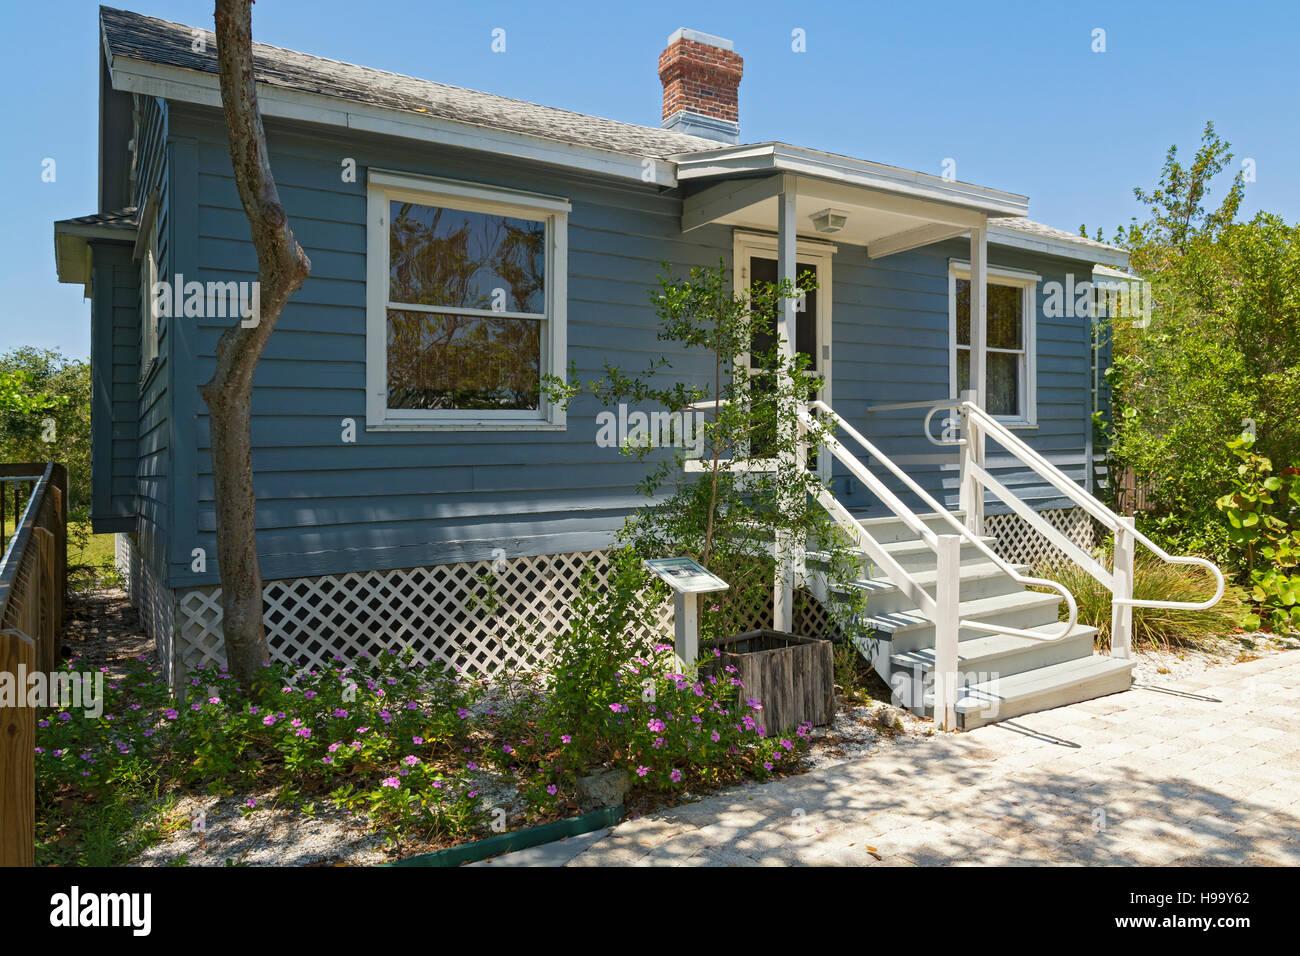 Florida, Sanibel Island, Sanibel Historical Museum & Village, 1925 Morning Glories Cottage a  Sears & Roebuck - Stock Image